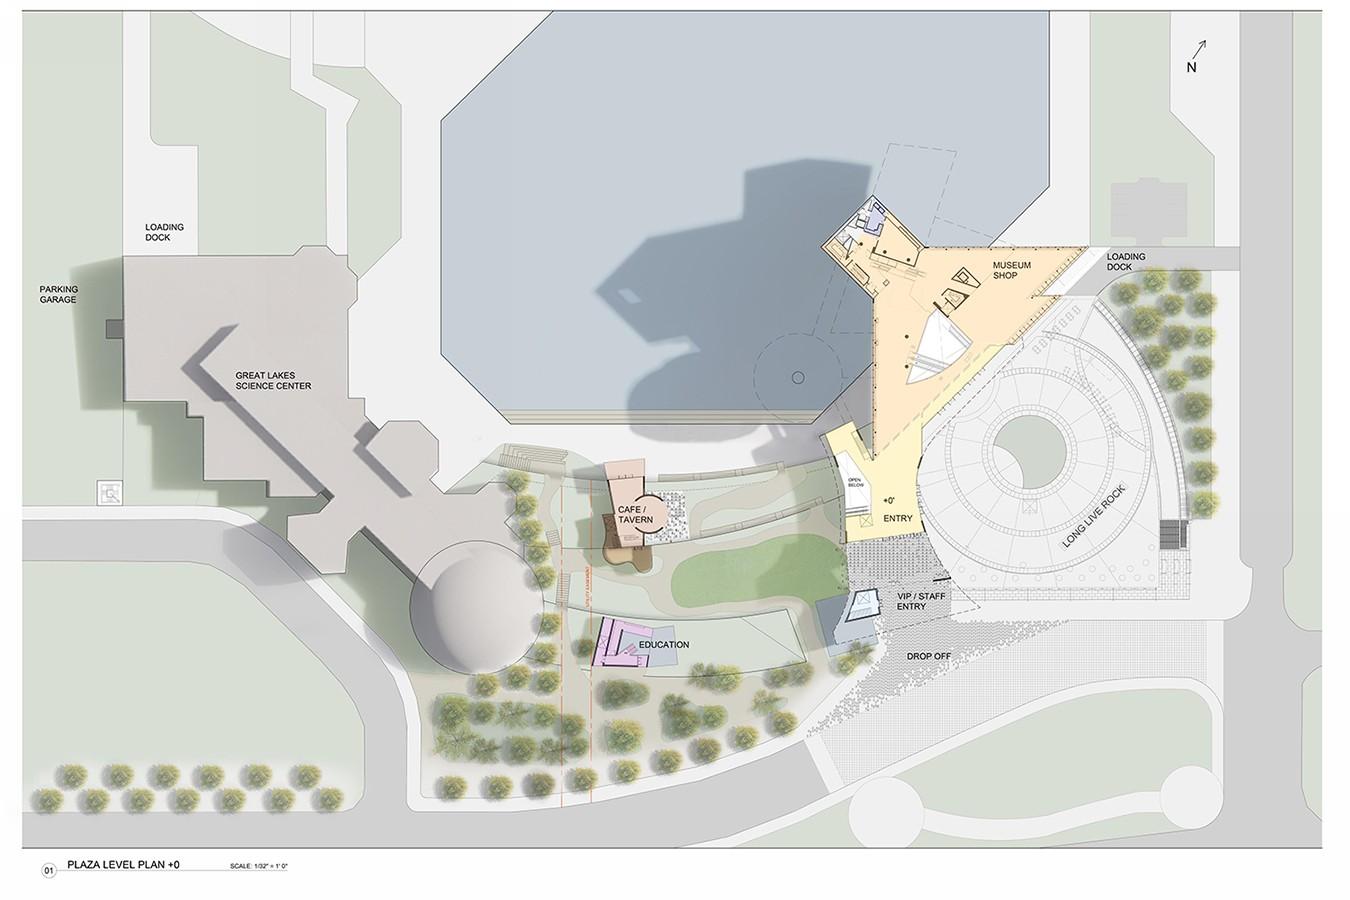 https://stevenholl.sfo2.digitaloceanspaces.com/uploads/projects/project-images/plaza level plan.jpg